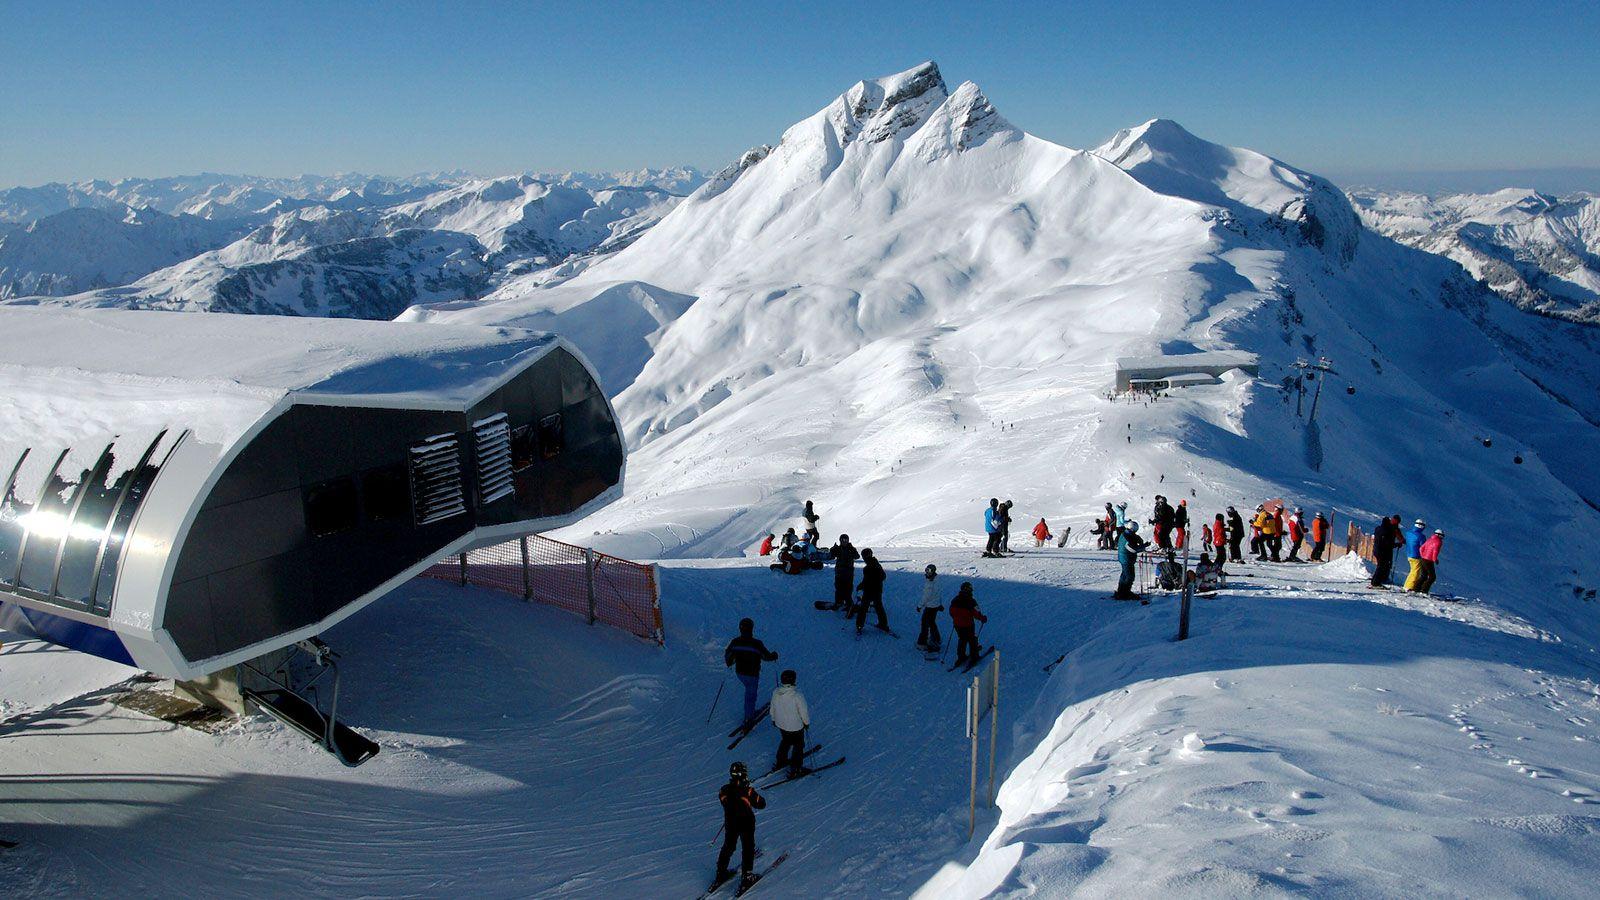 Bregenzerwald - Ski Trips for Schools and Groups